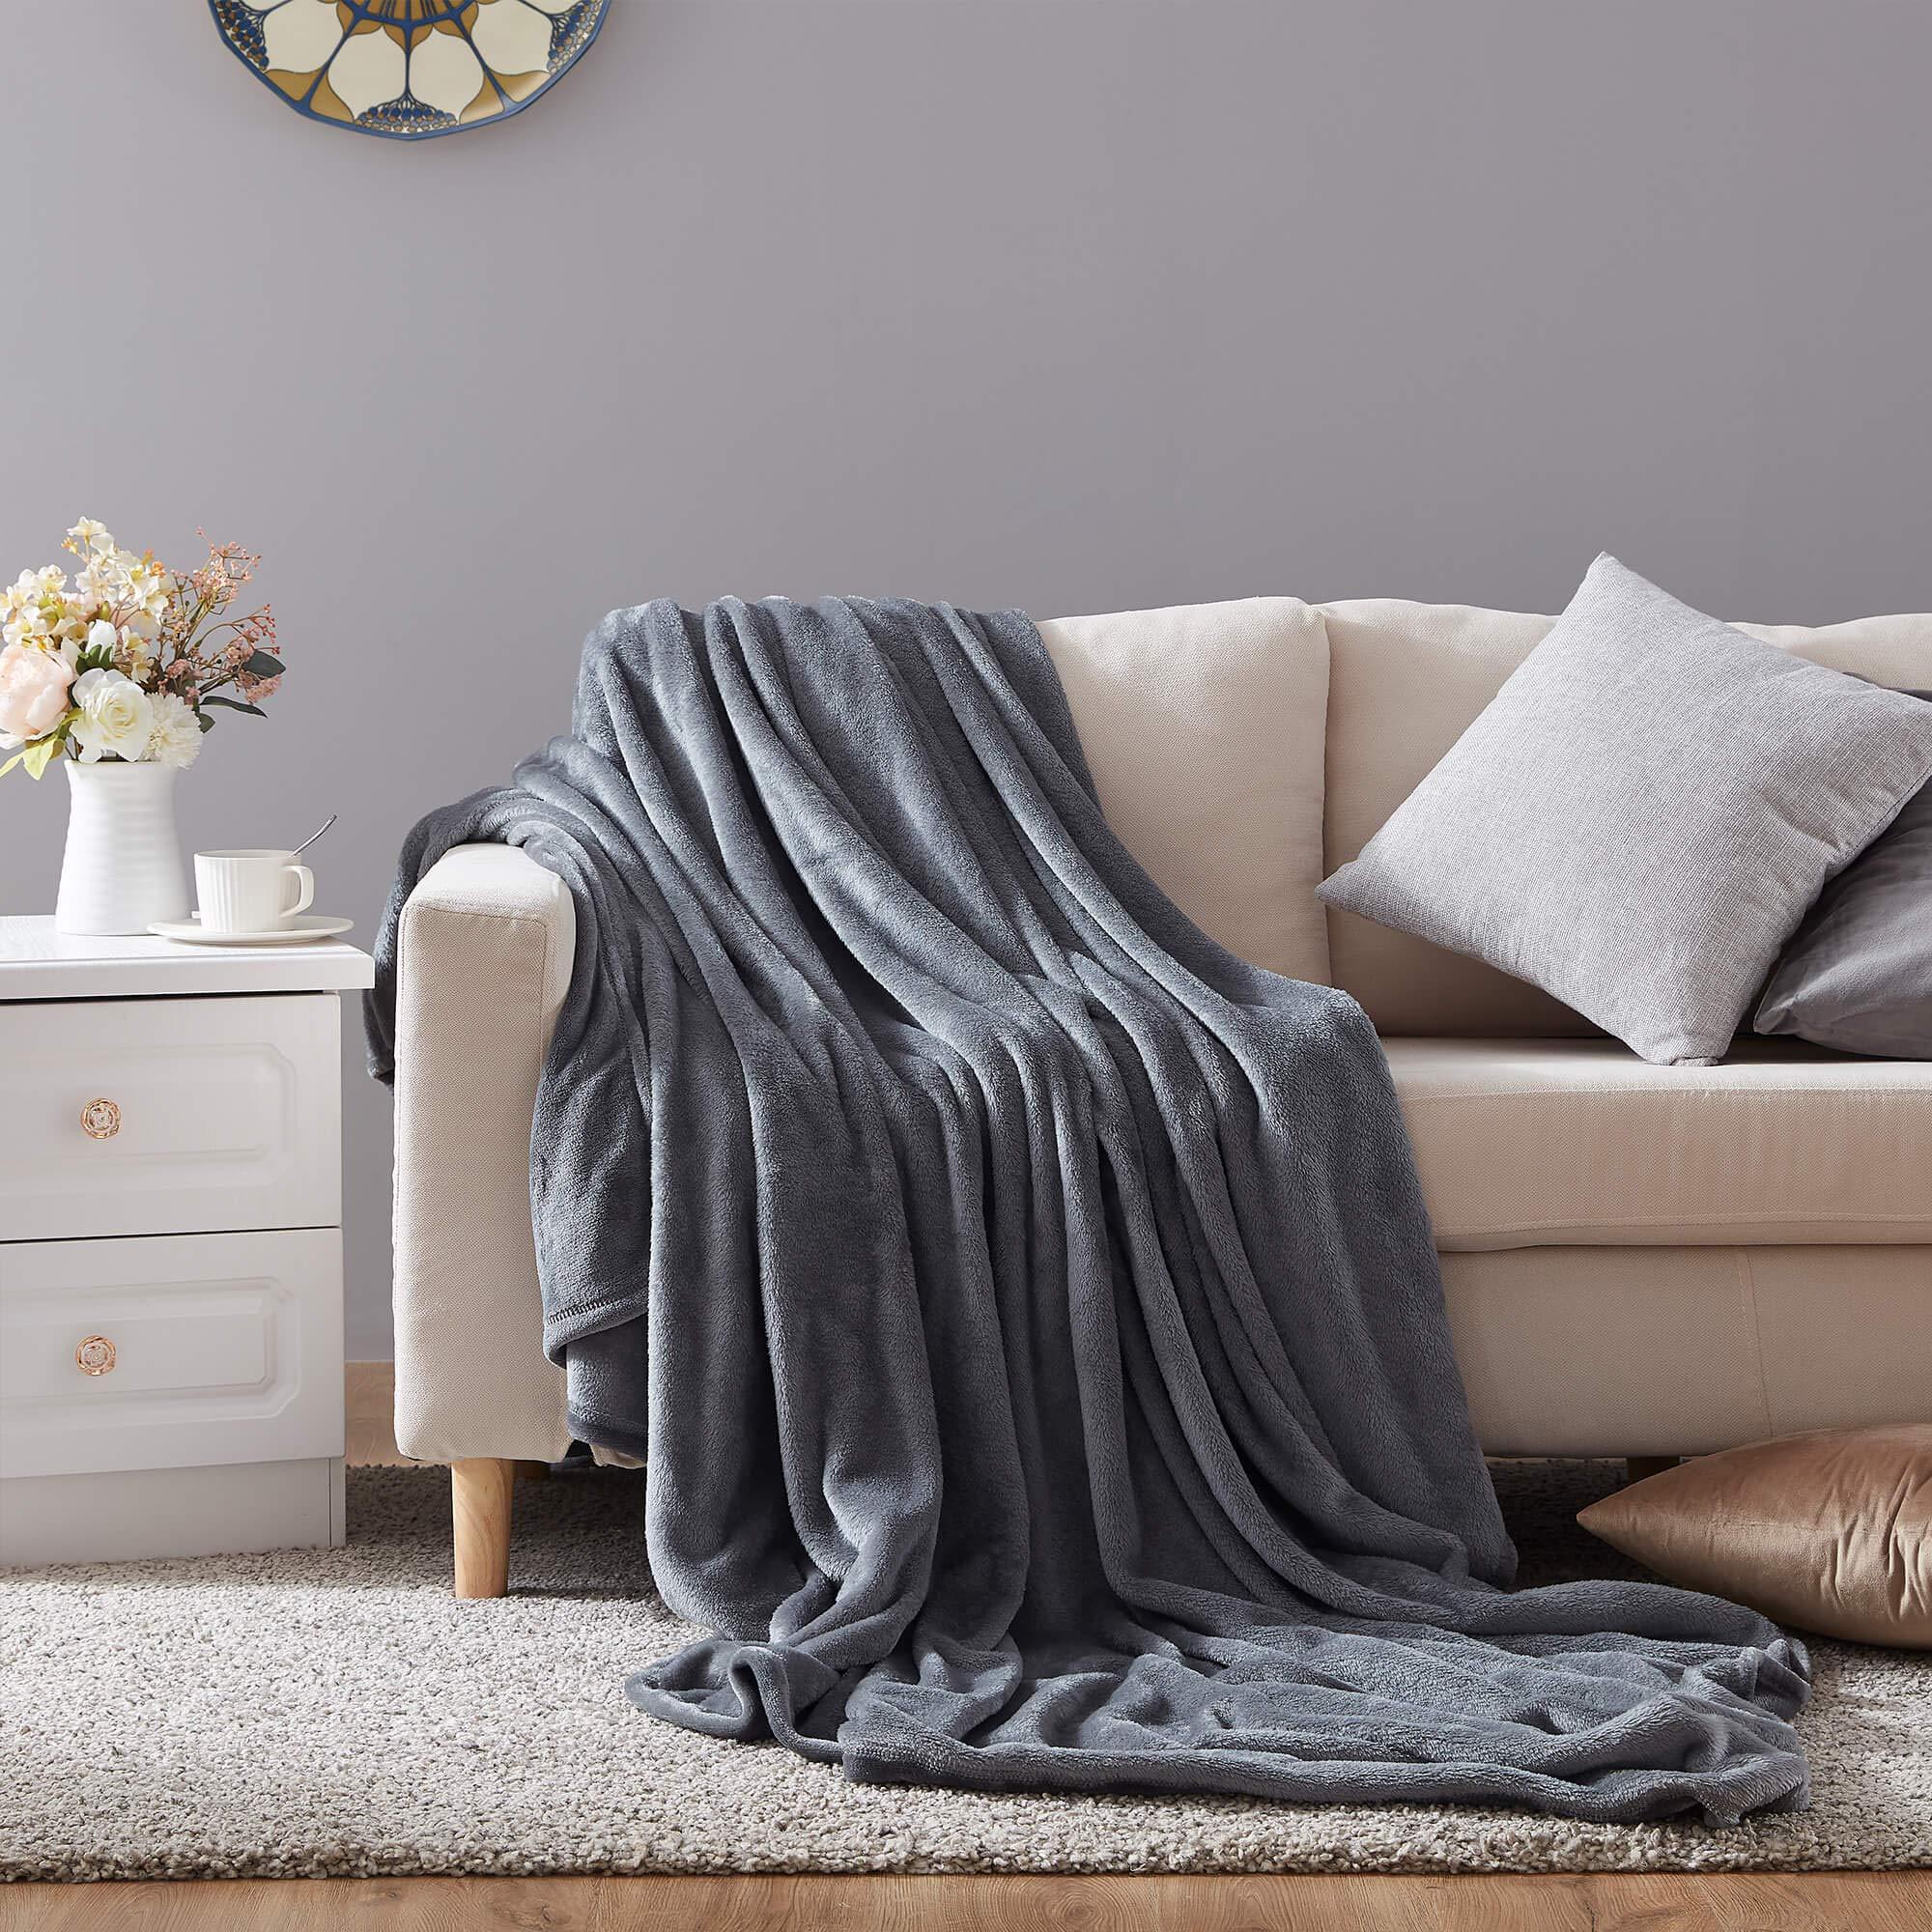 Hboemde Fleece Blanket Throw Size Dark Grey Soft Cozy Lightweight Bed Blanket Microfiber Plush Flannel Blanket for Couch,50x60in